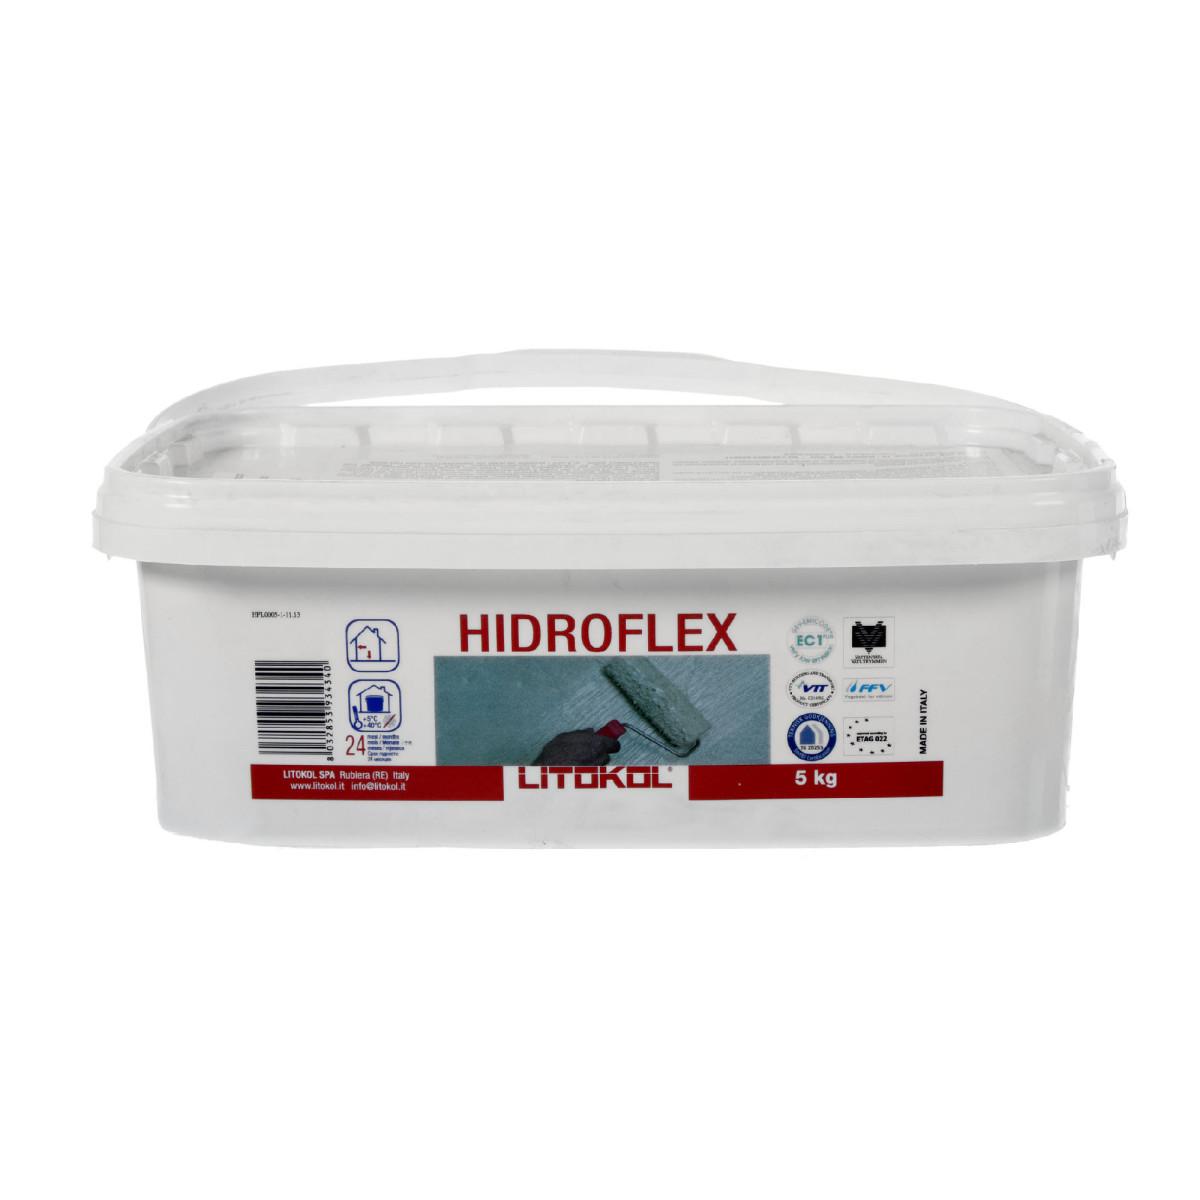 Гидроизоляция Hidroflex 5 кг